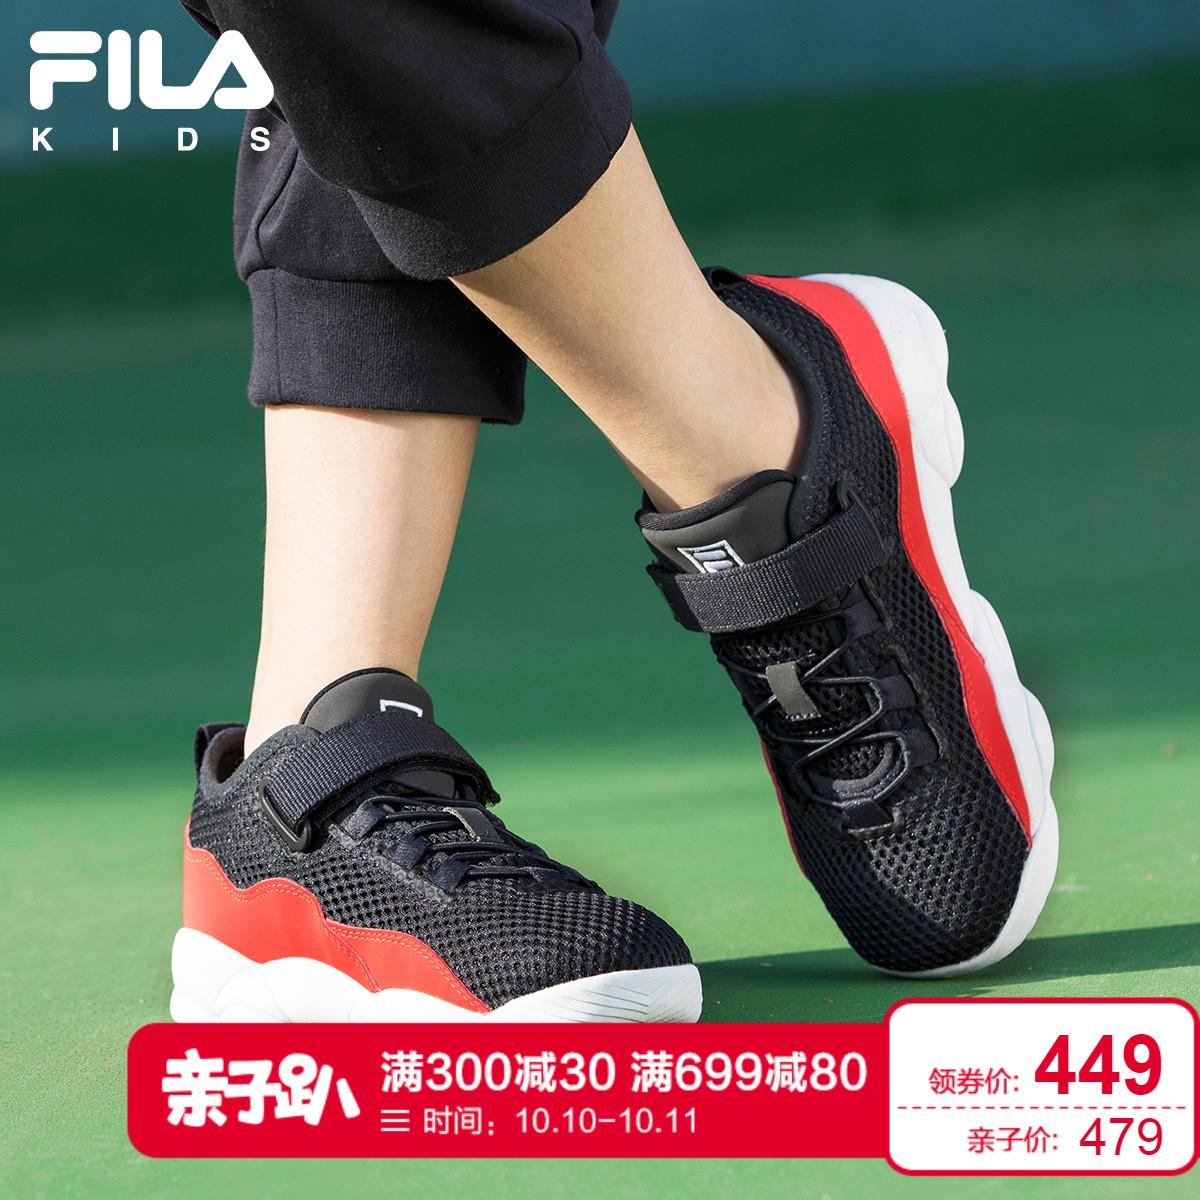 FILA斐乐童鞋男女童跑鞋轻质透气耐磨防滑儿童篮球鞋2018夏季新款